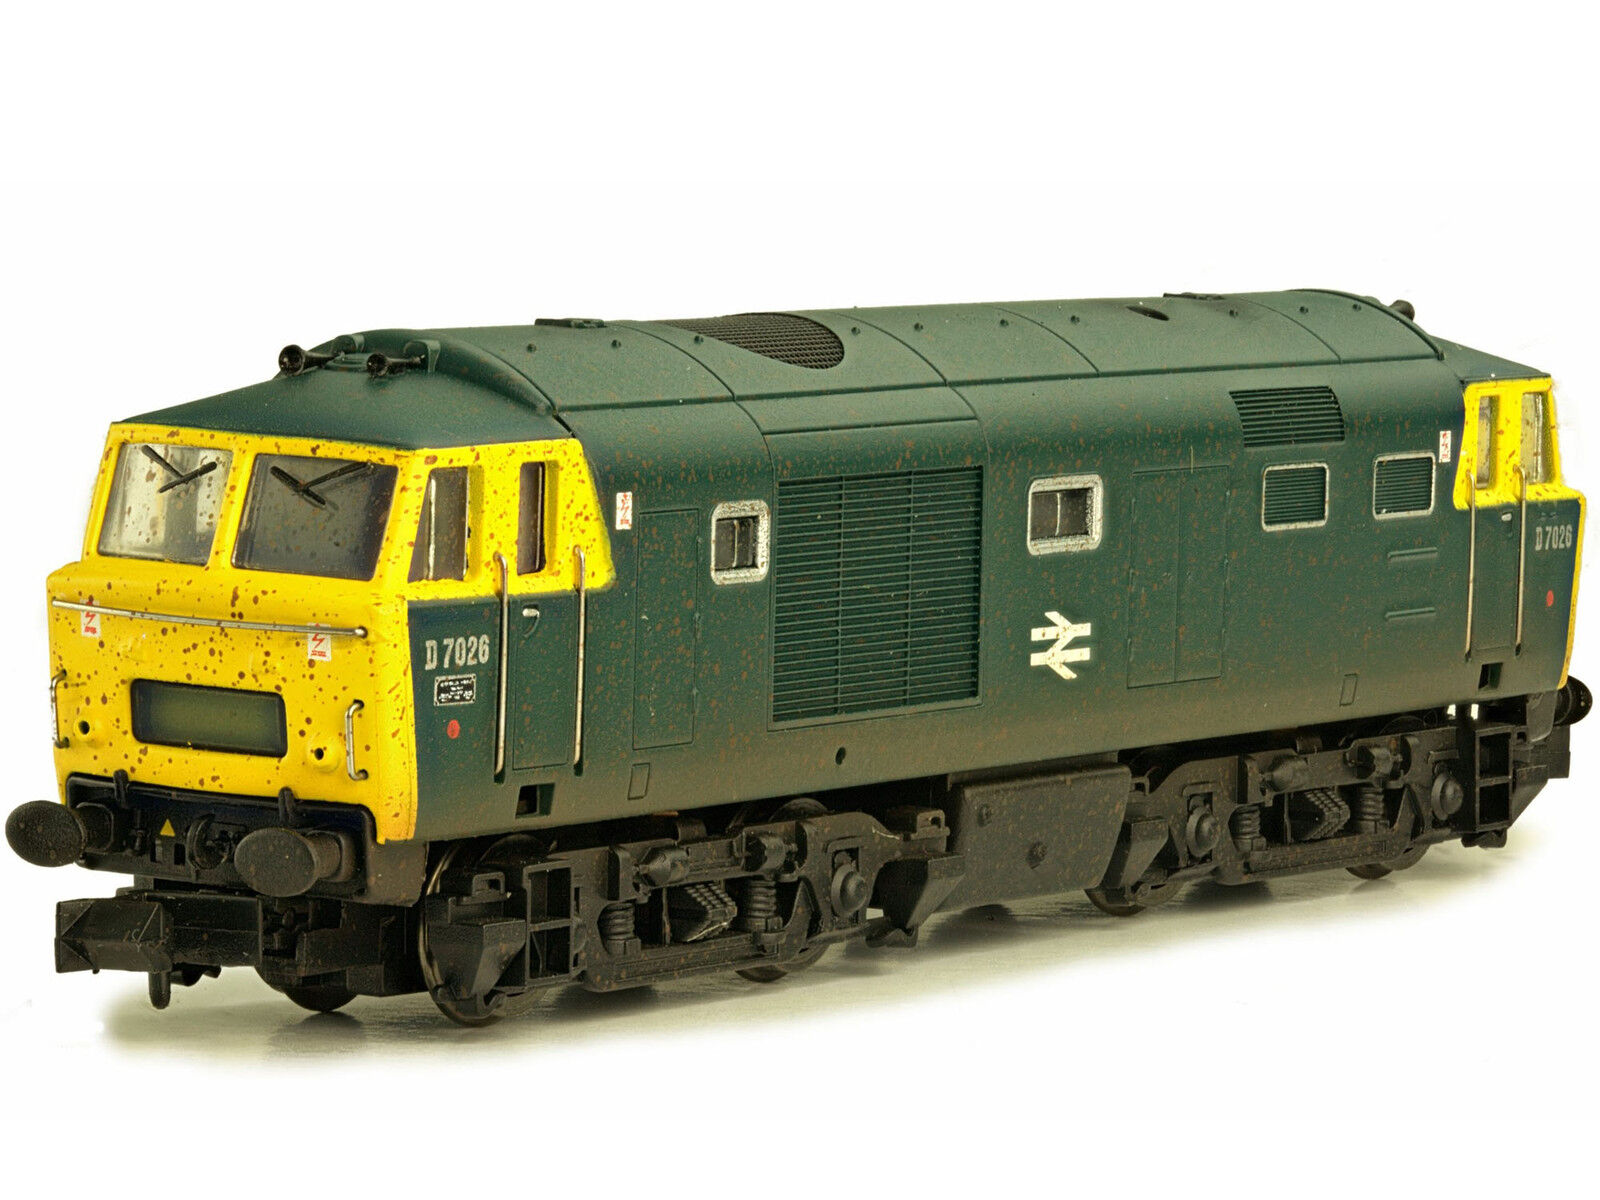 Dapol 2D-018-002 - Diesellok Hymek D7026 BR Blau gealtert - Spur N - NEU